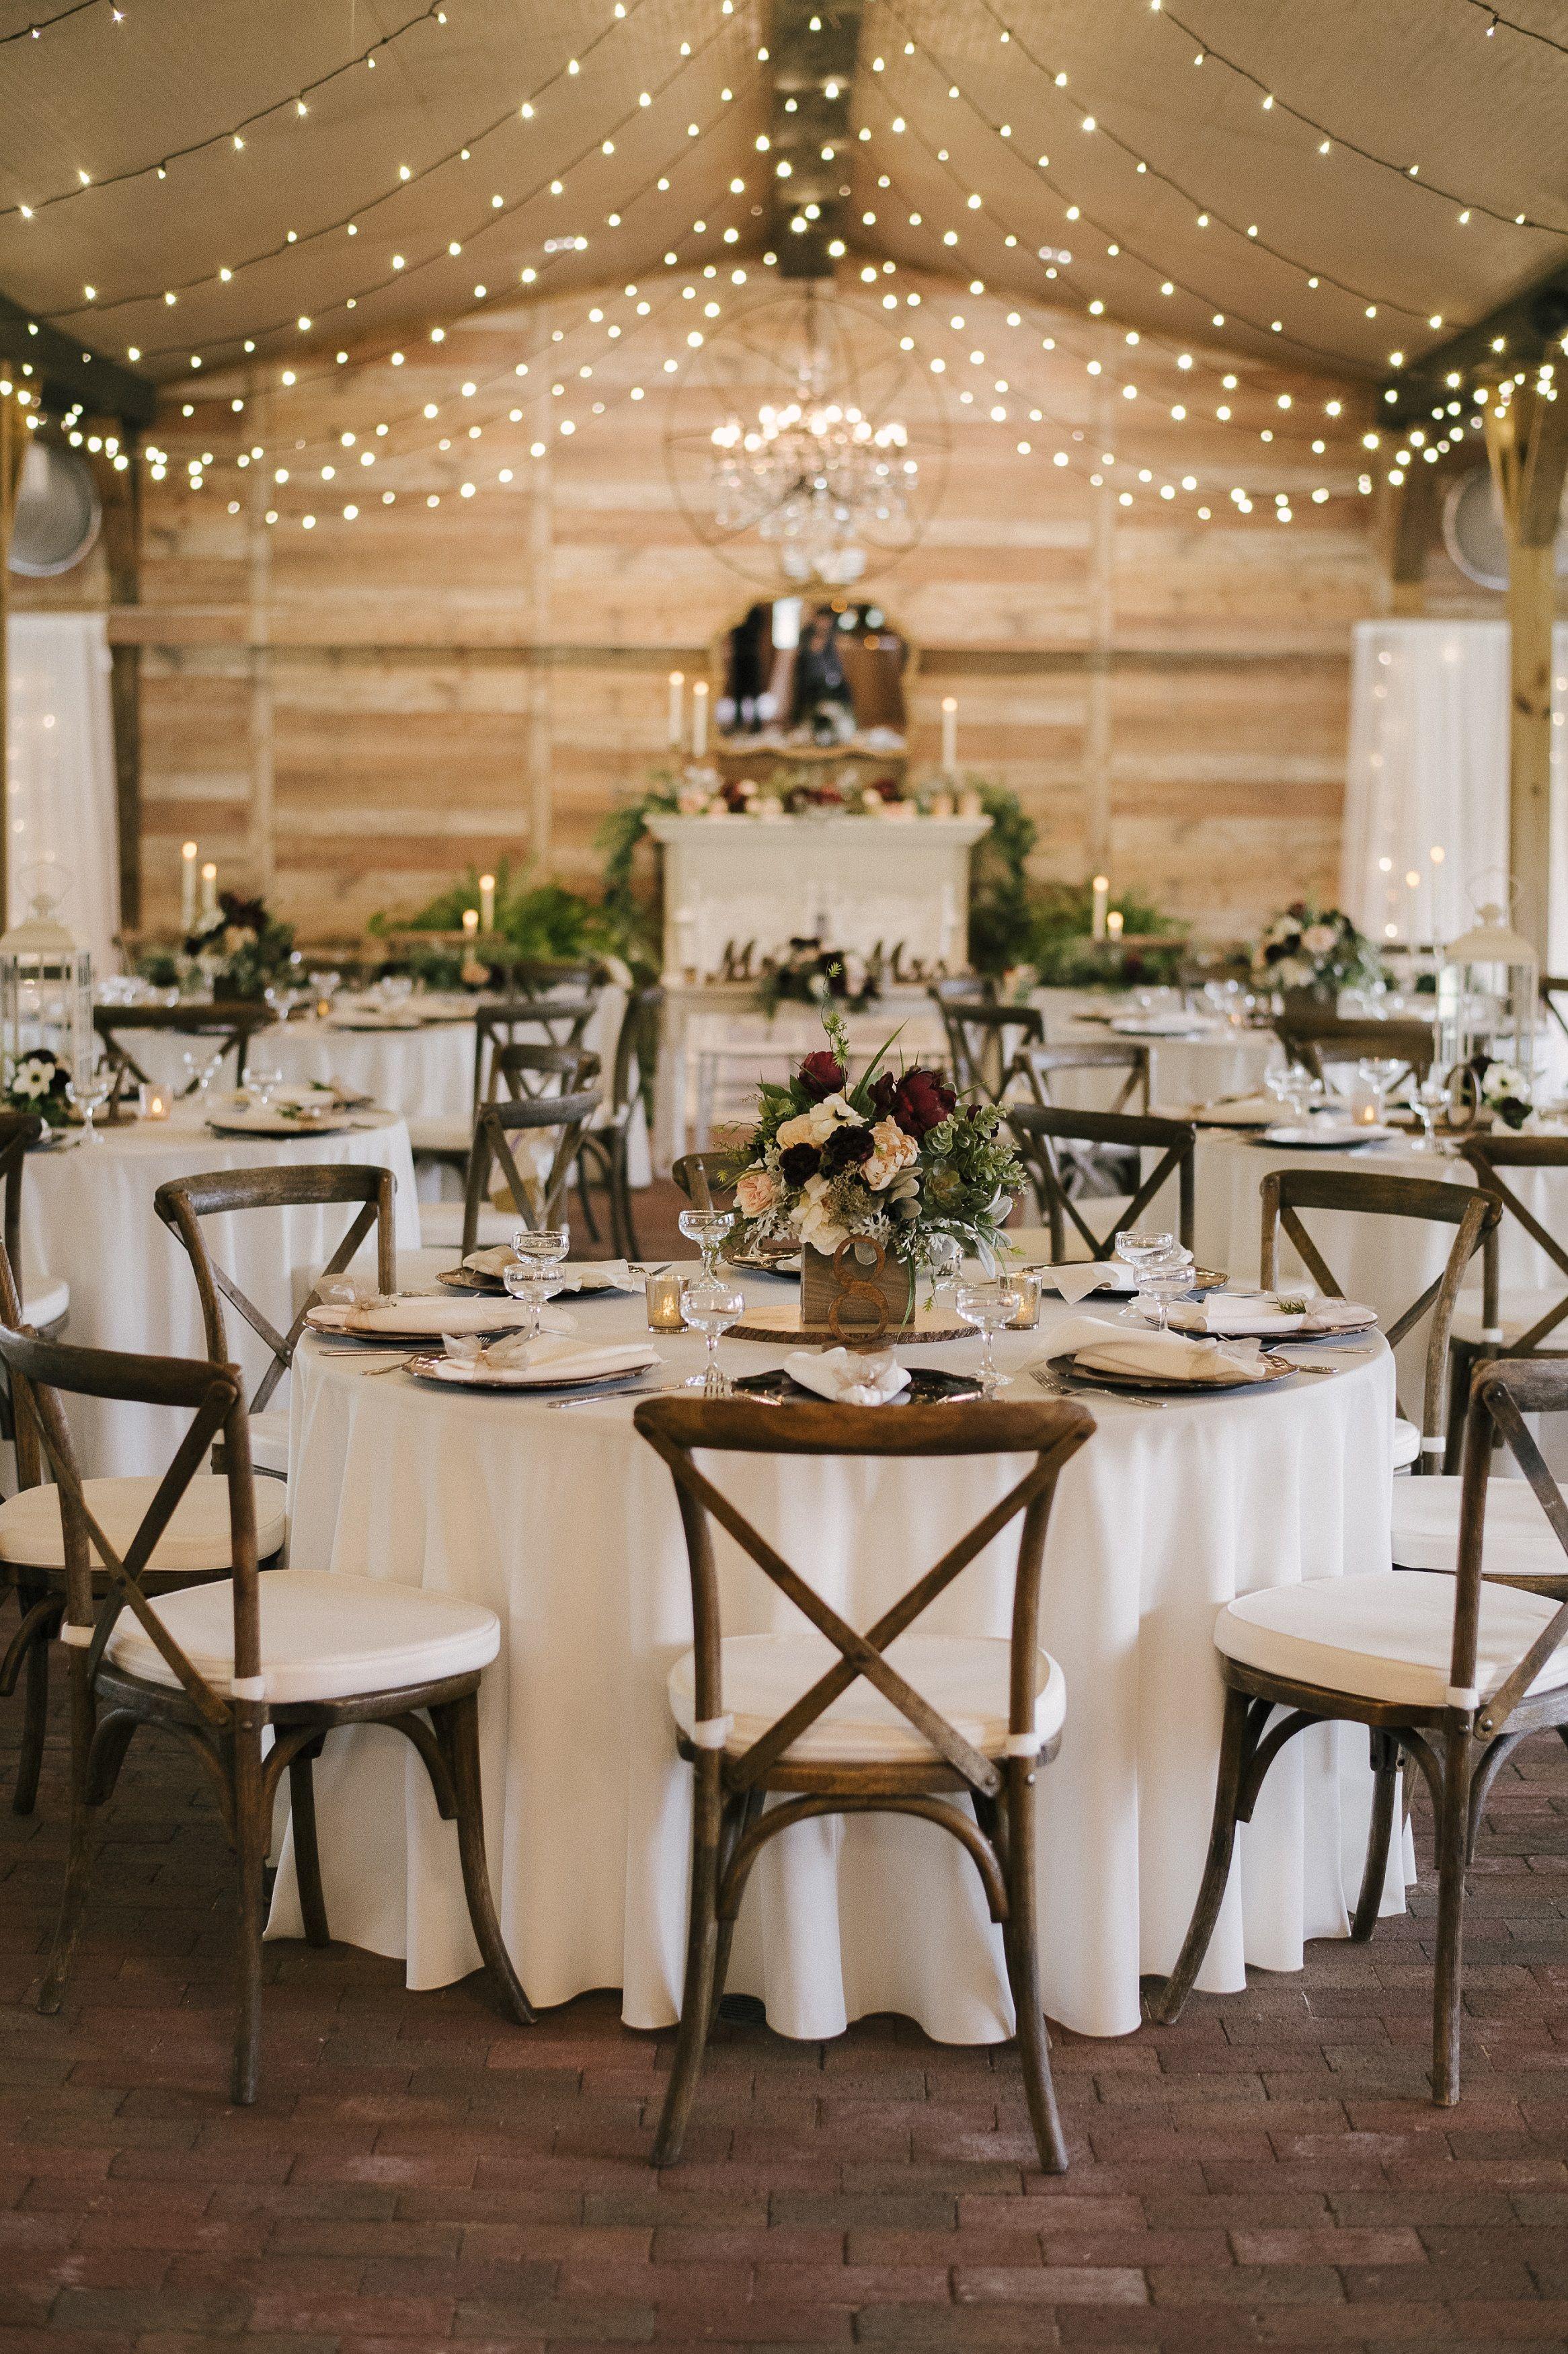 12950 East Wheeler Road, Dover, FL 33527, USA | Wedding reception  decorations, Wedding decorations, Chic wedding